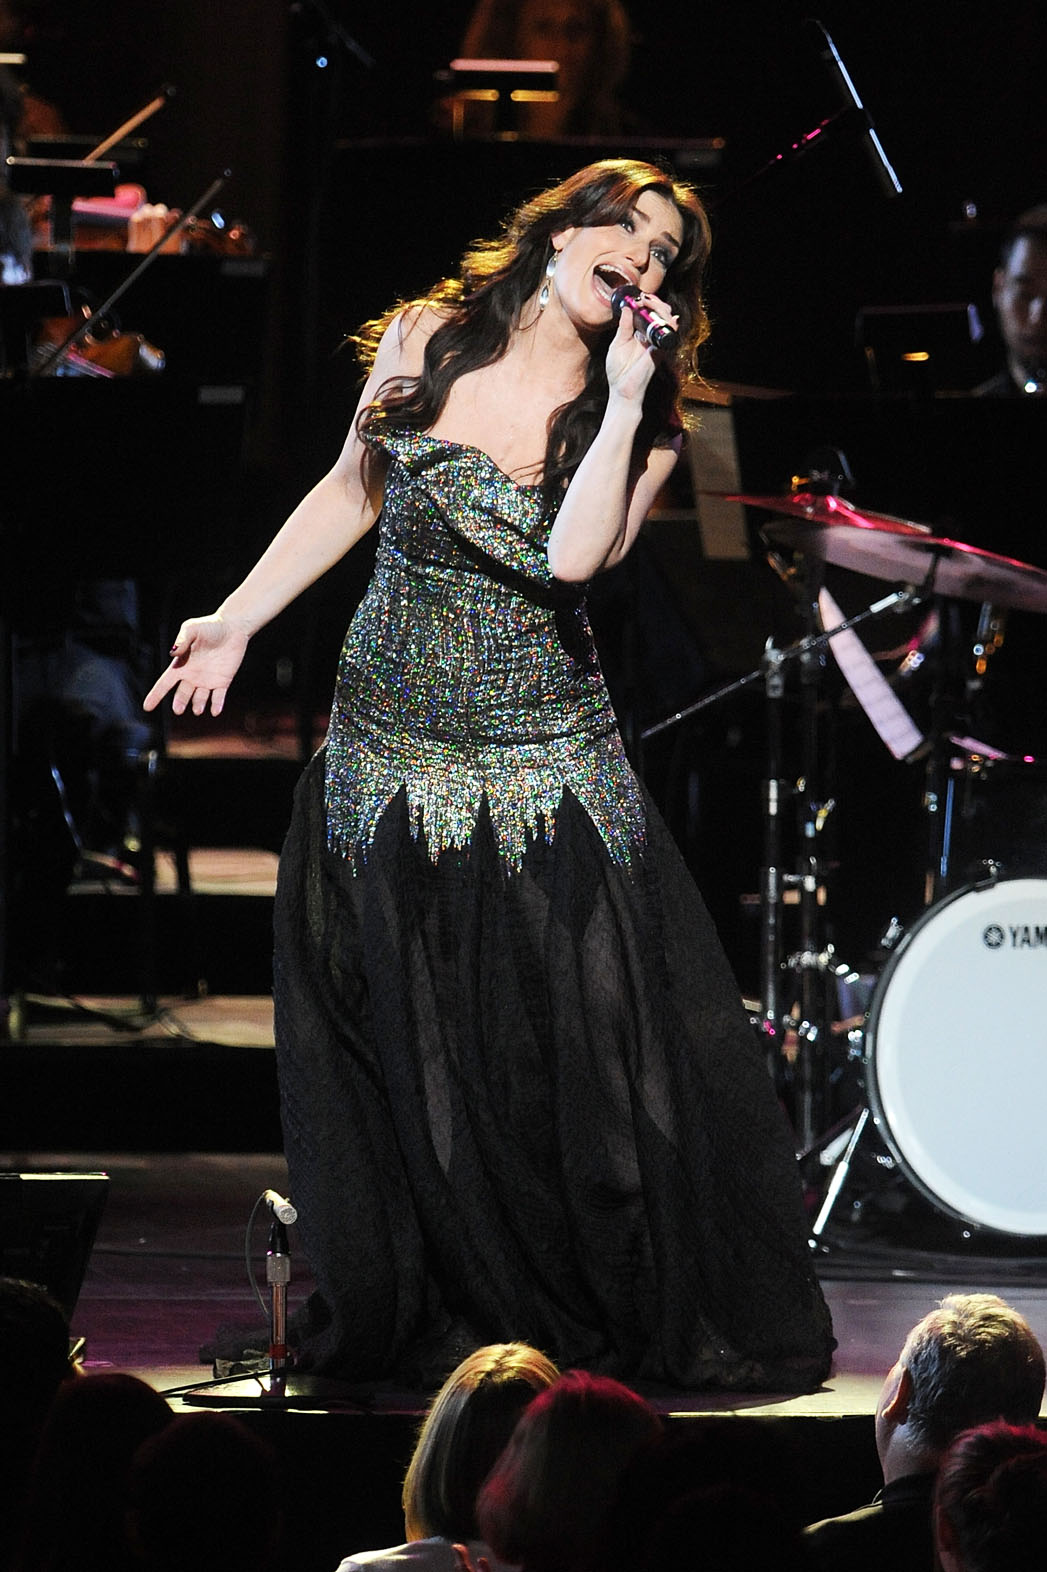 Idina Menzel Radio City Music Hall Performing - P 2014